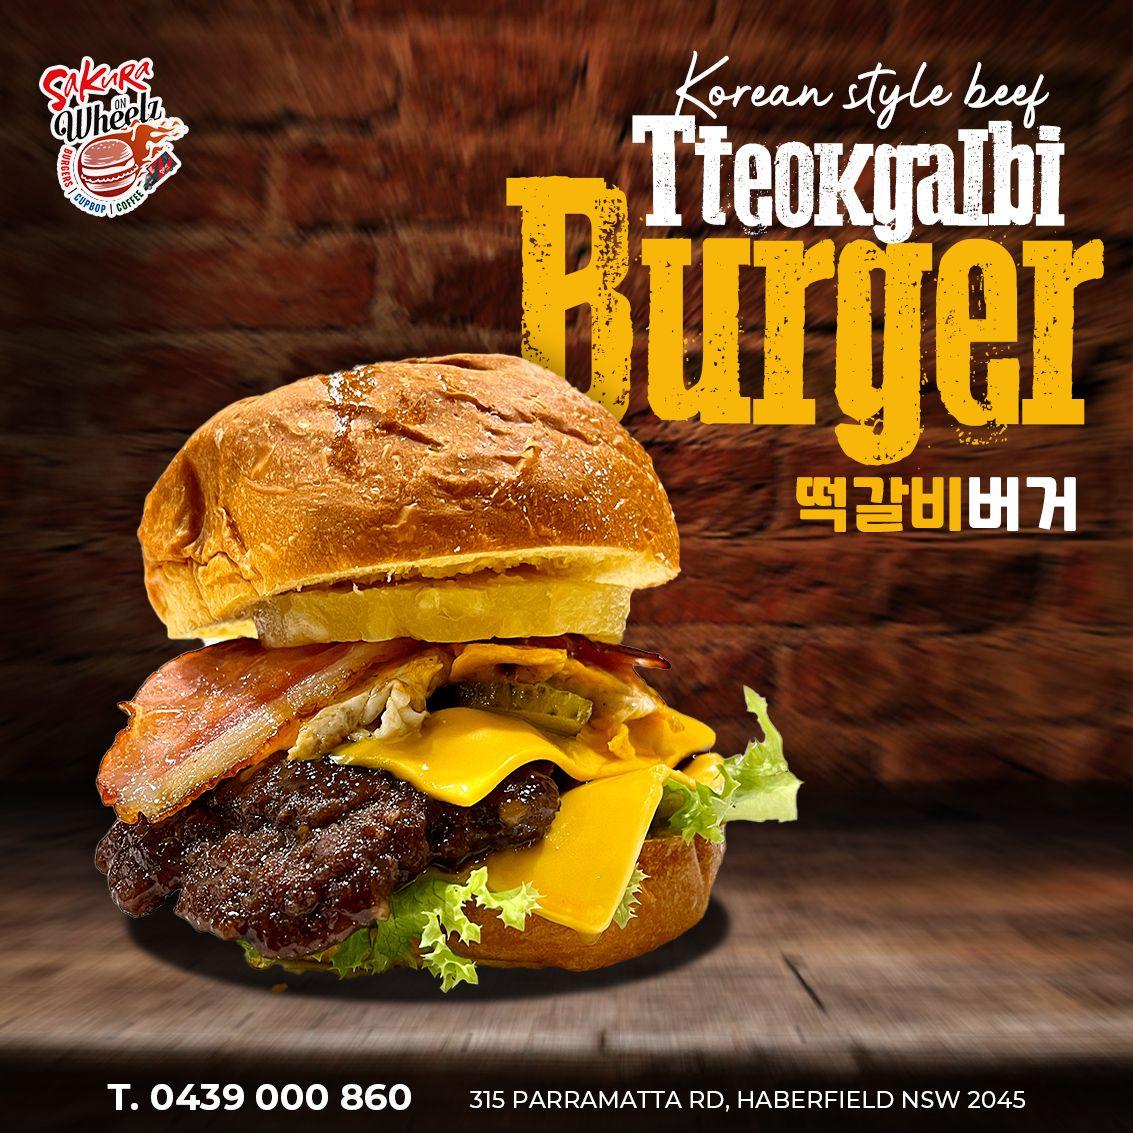 Tteokgalbi Burger(Korean style Beef patty)